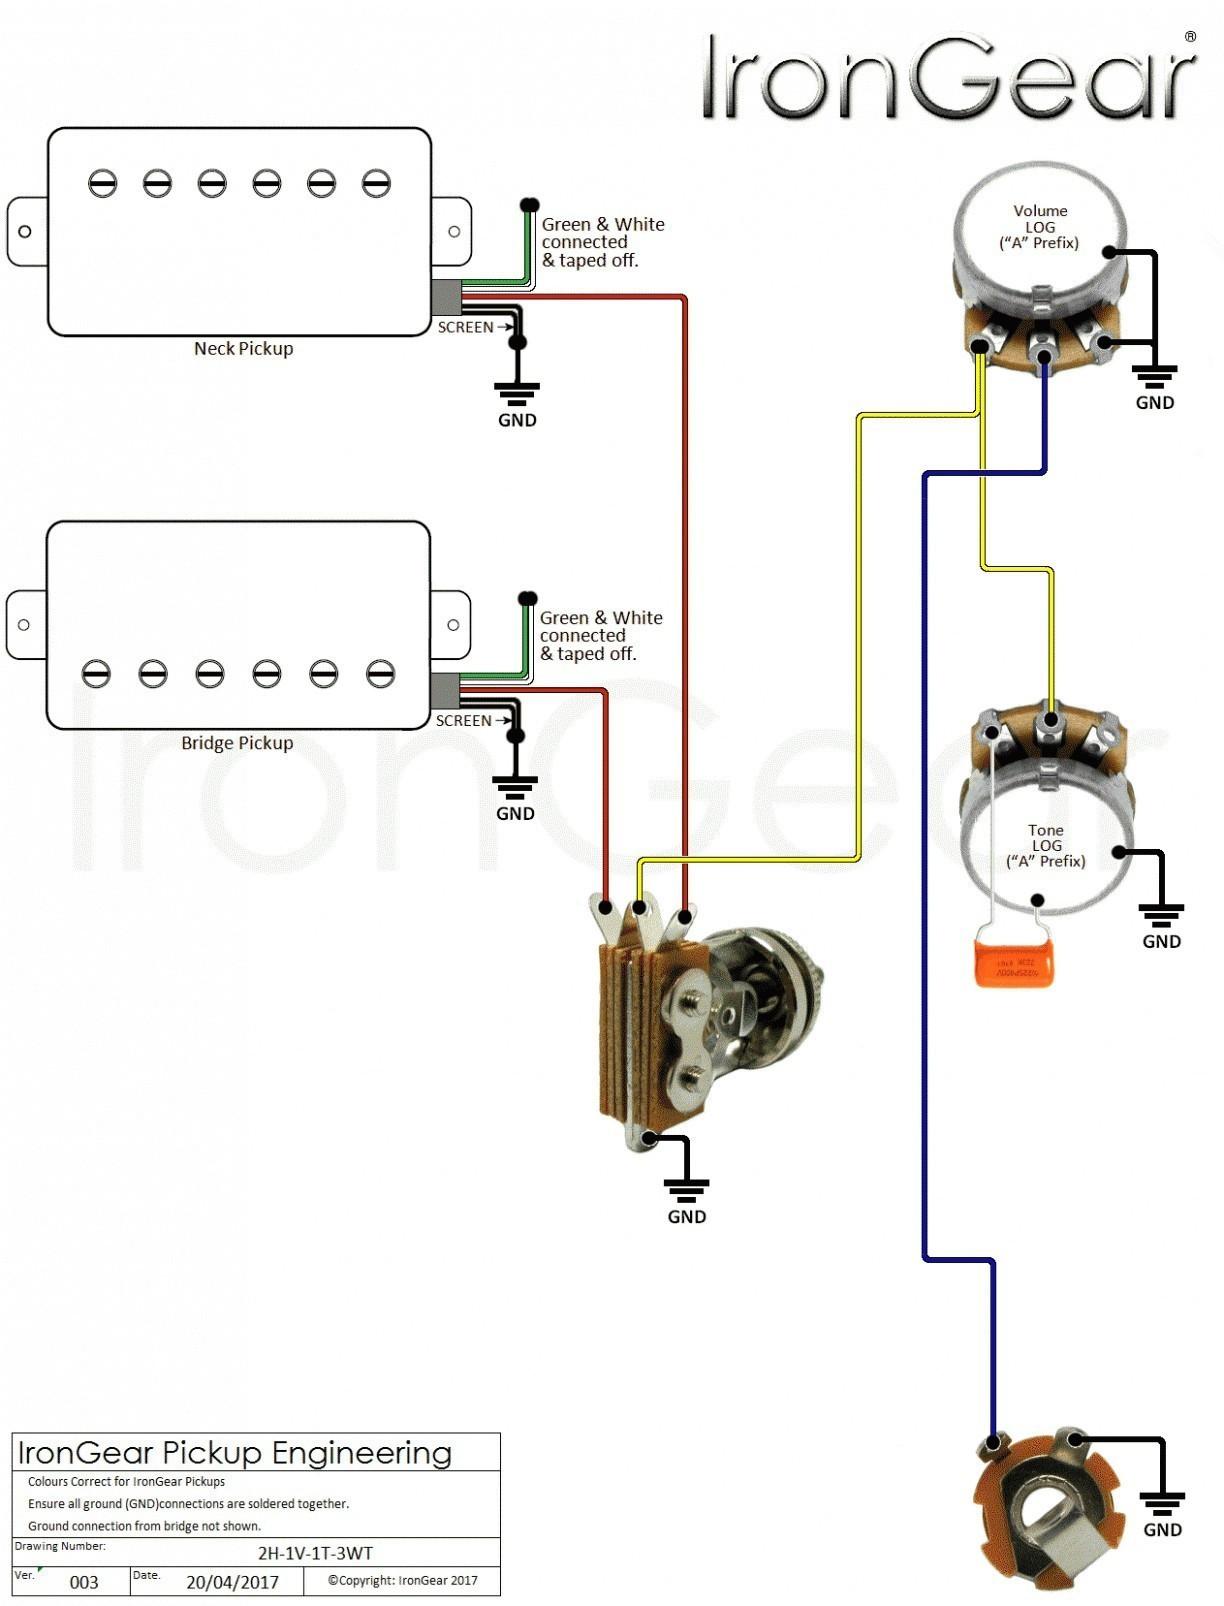 Gretsch Guitar Wiring Diagram Save Wiring Diagram Guitar Jack New Double  Neck Guitar Wiring Diagram